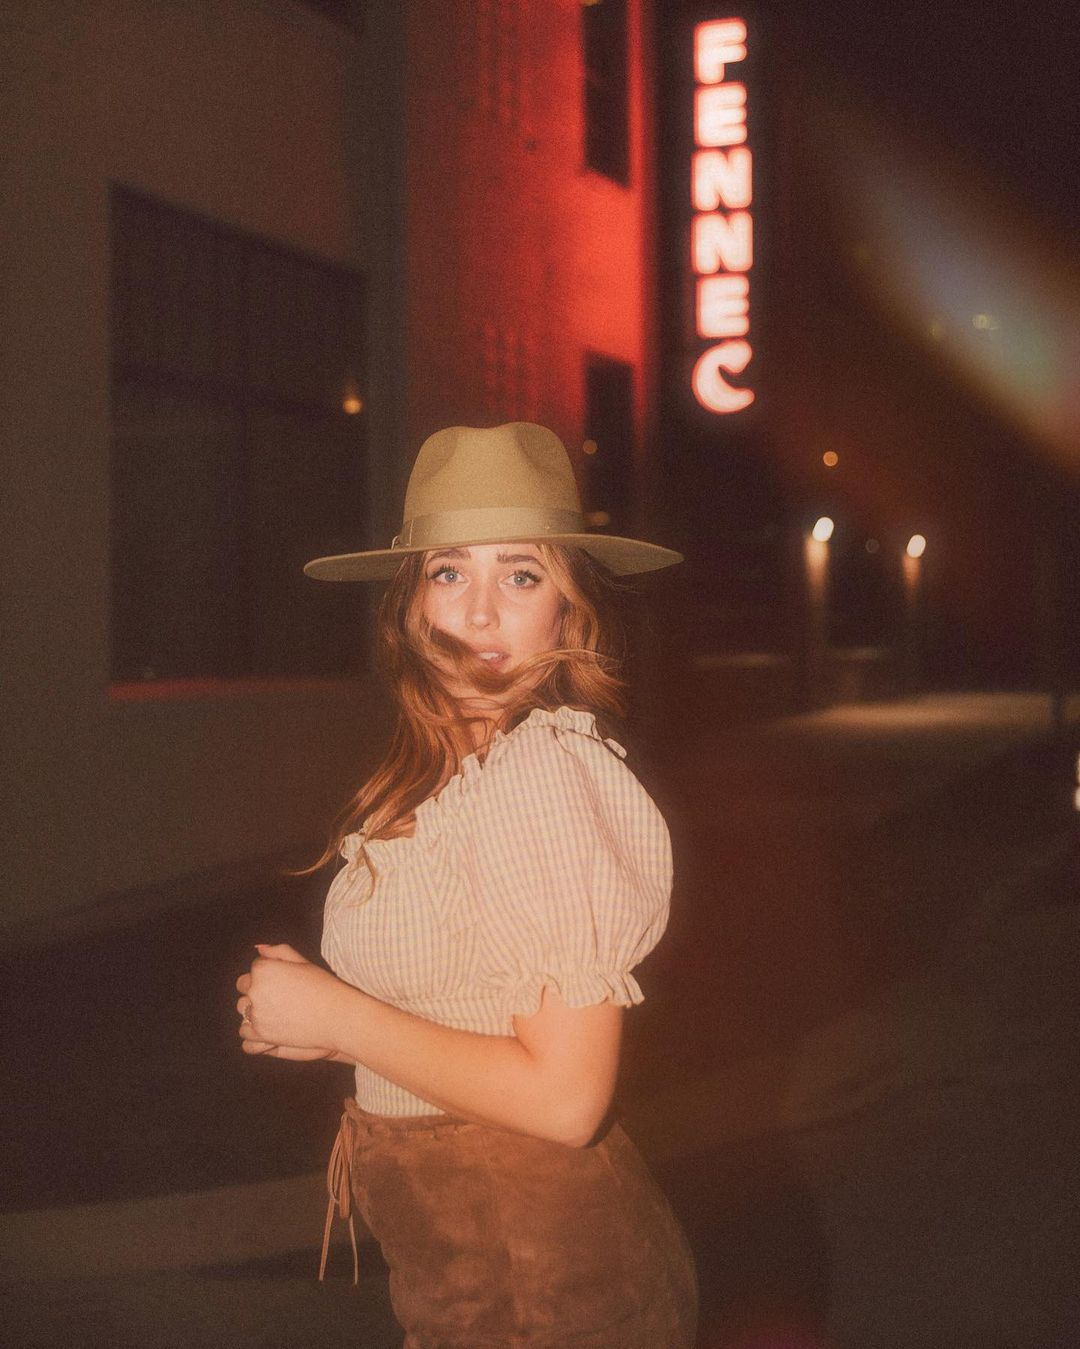 Photo of Kenslie by Ginnard